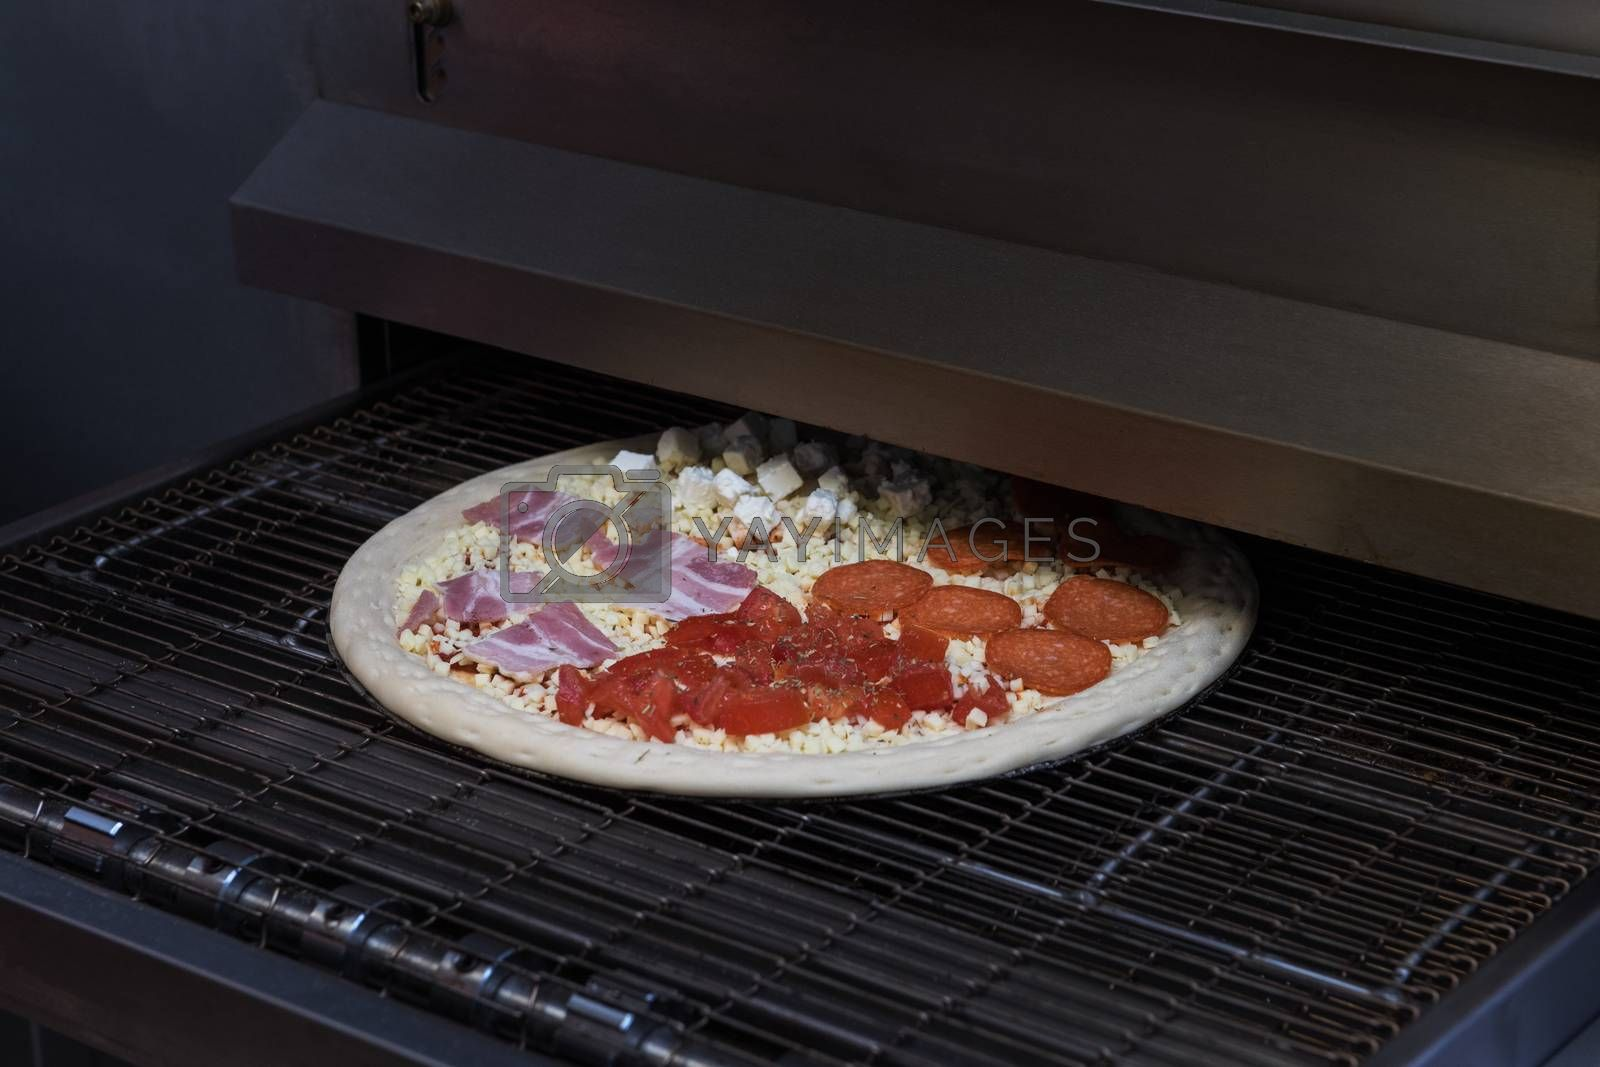 Preparing pizza in oven at restaurant kitchen